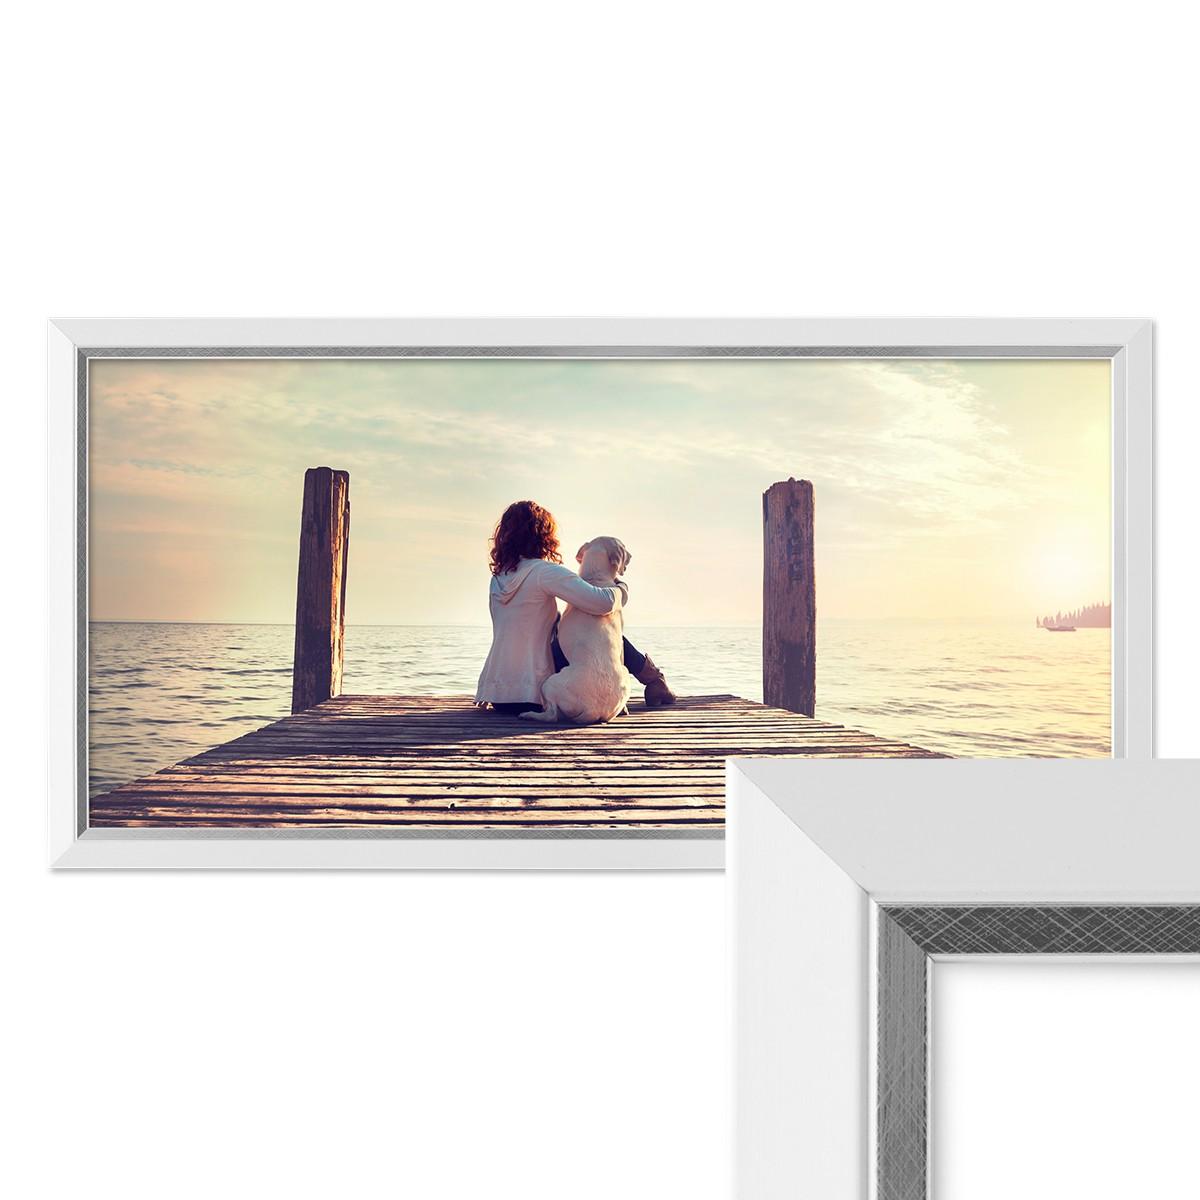 Panorama-Bilderrahmen 30x60 cm Weiss Modern mit Silberkante ...